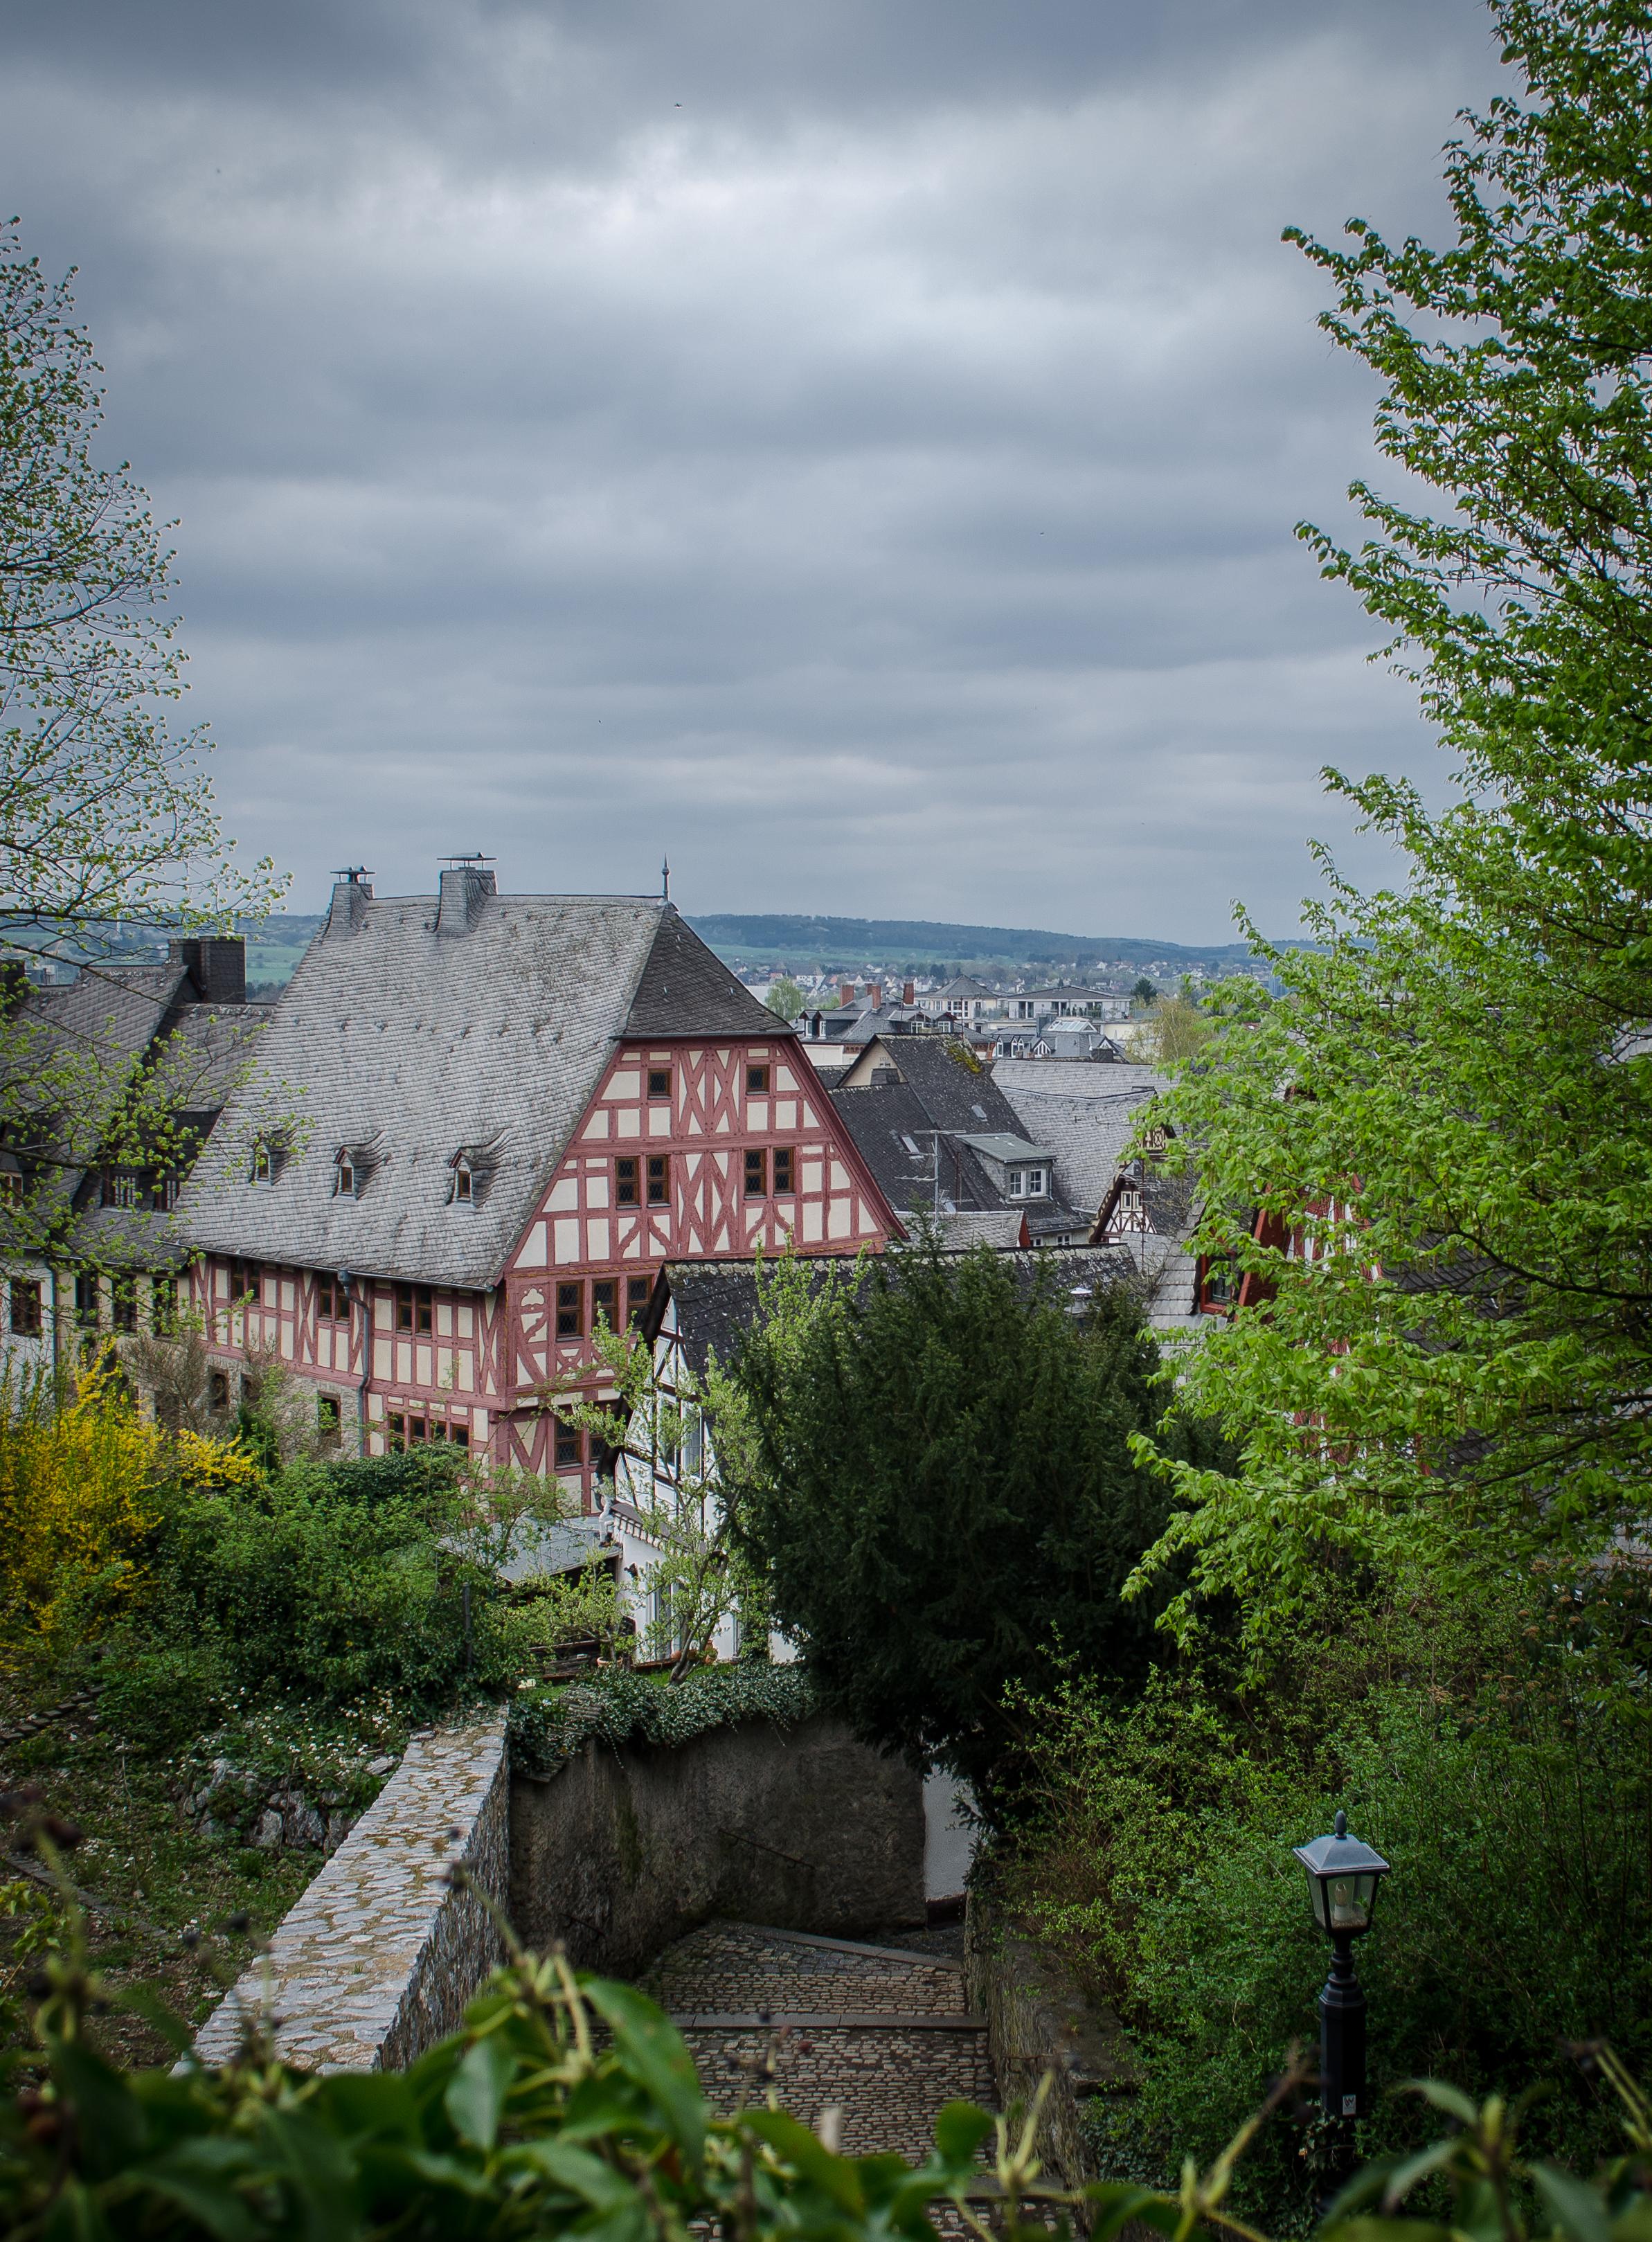 File:Limburg-Roemer-2-4-6-View.jpg